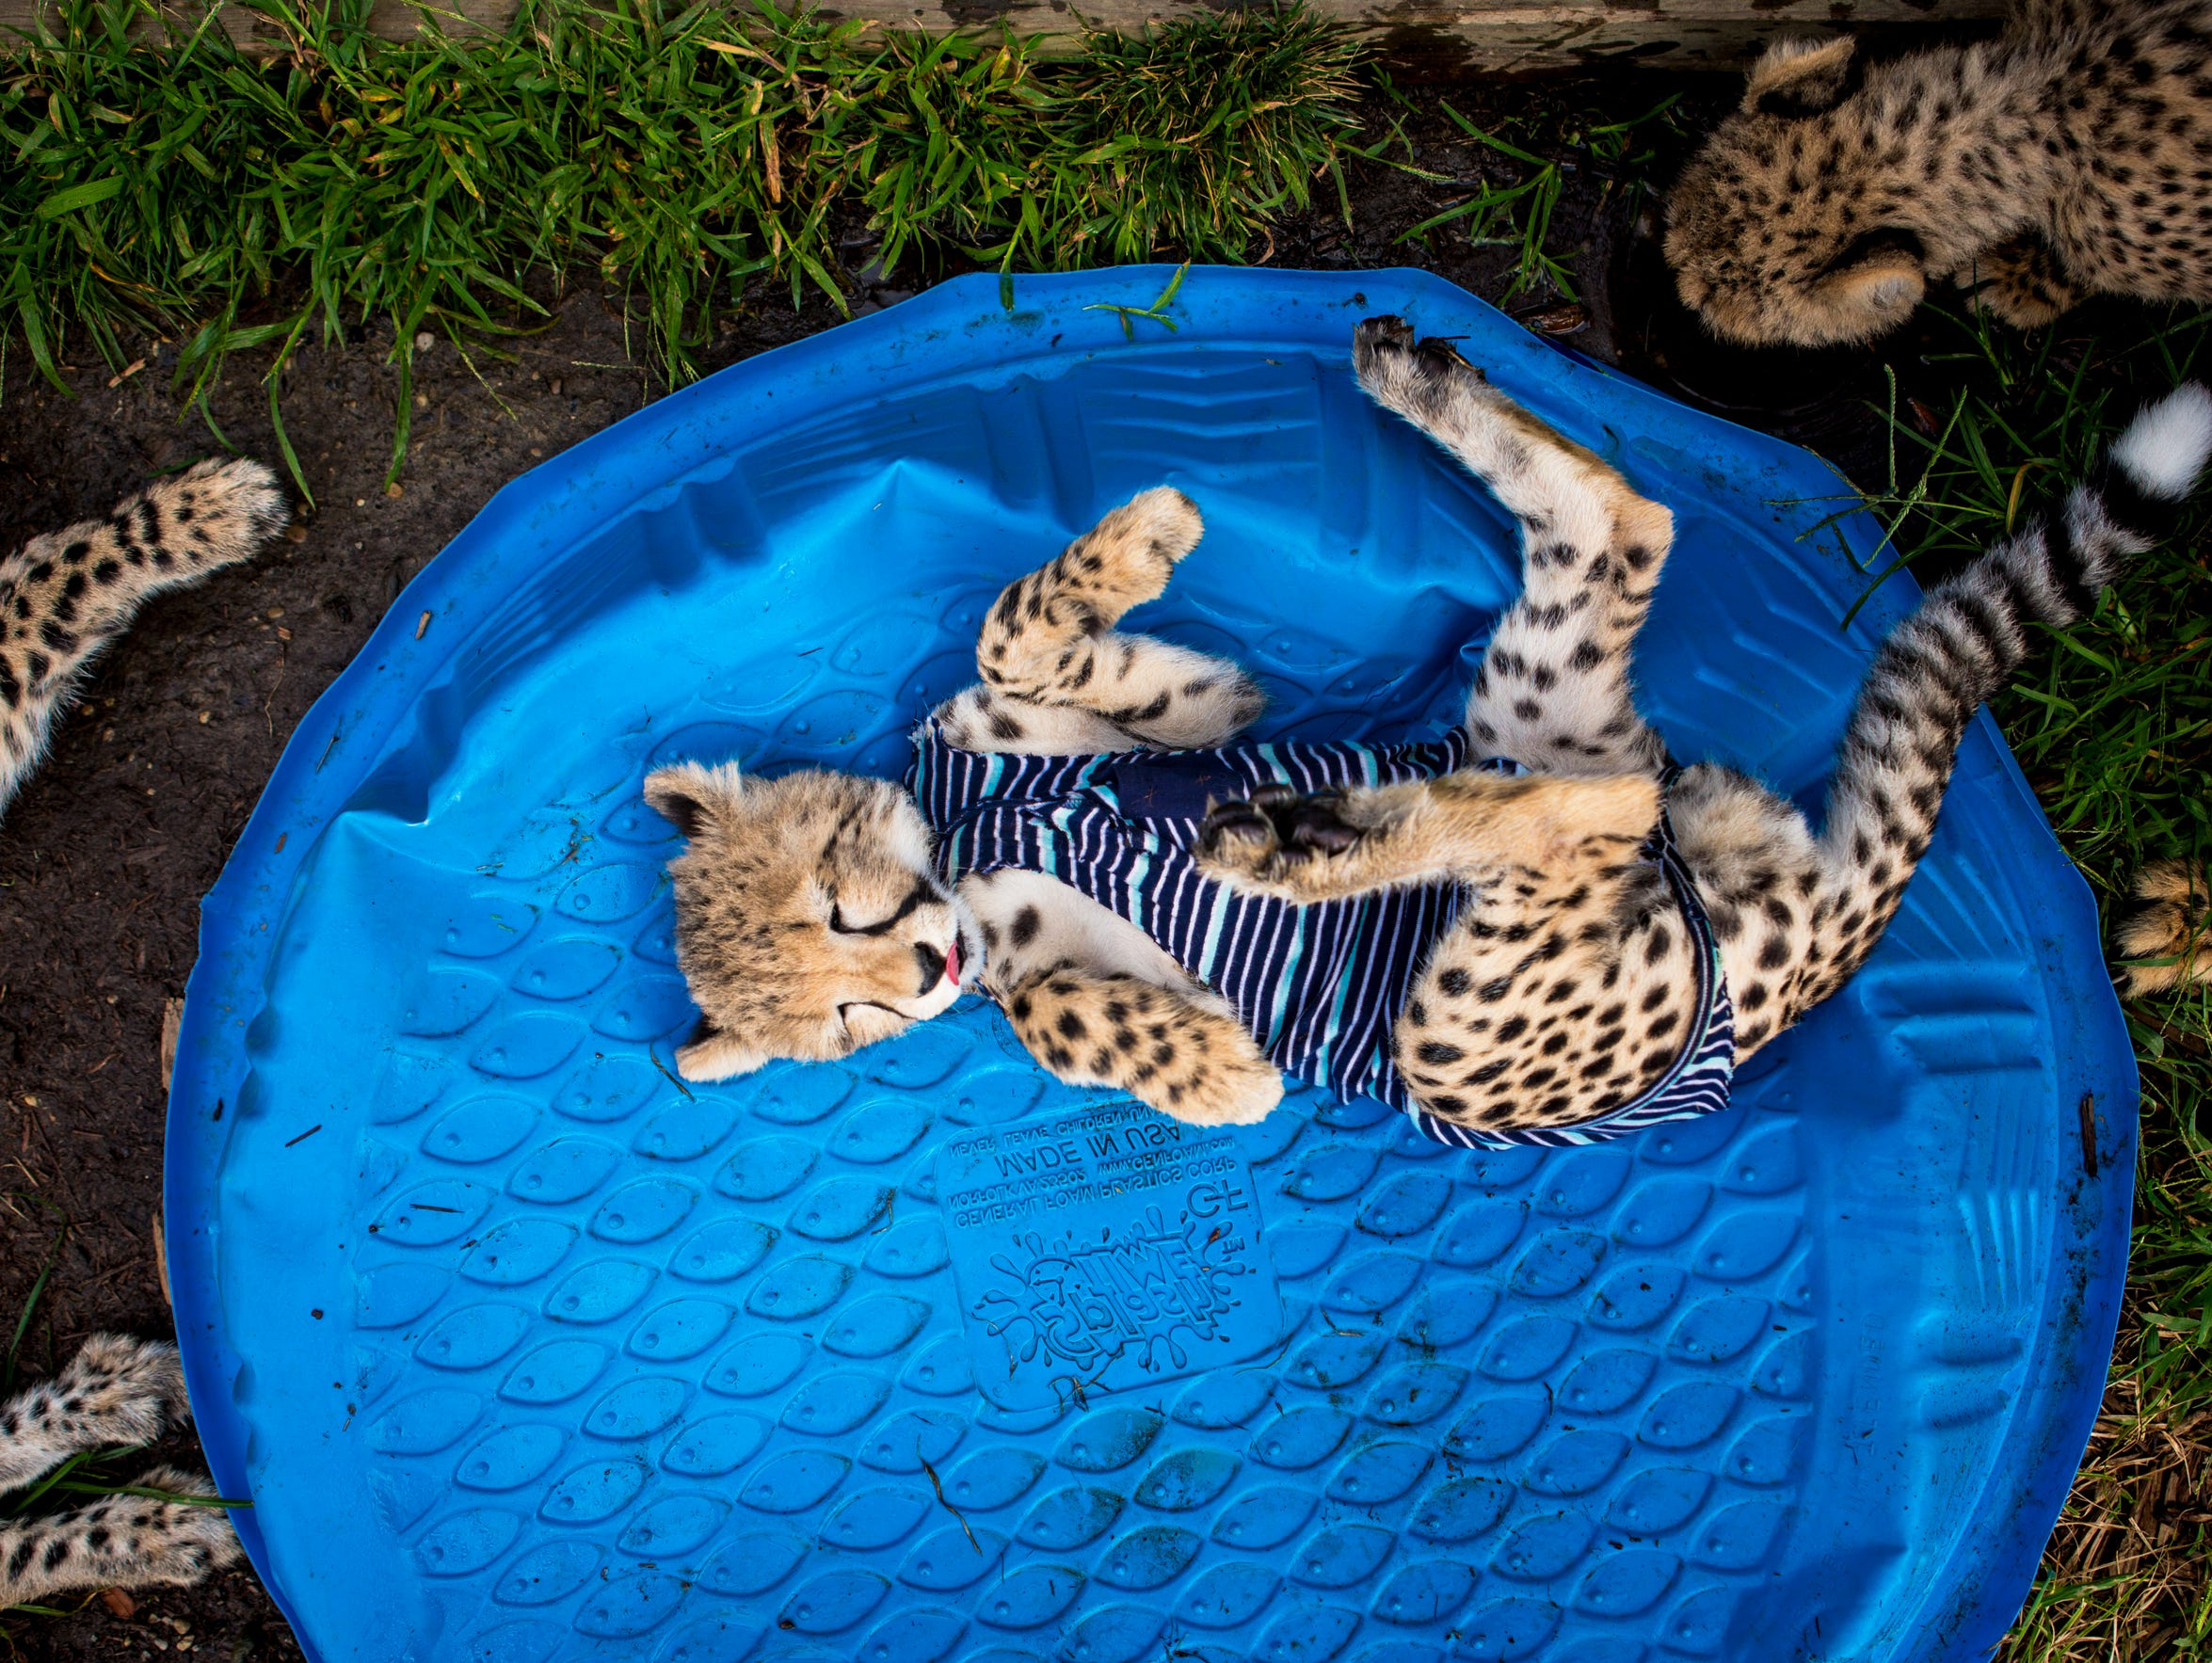 Redd, one of three Cincinnati Zoo cheetah cubs born